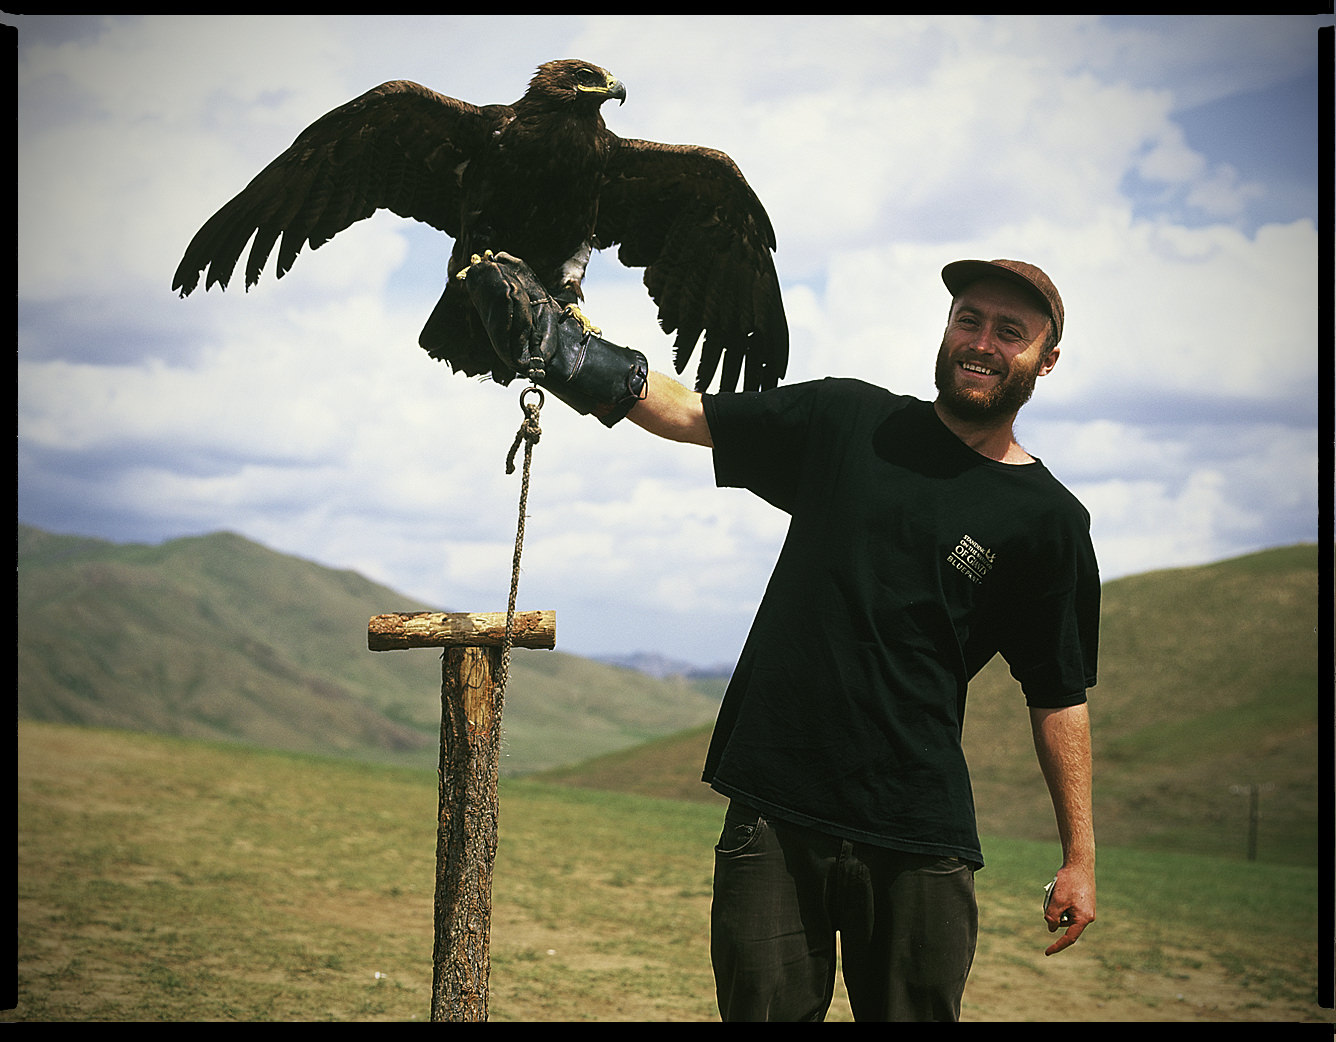 MediumFormatPatrikWallner_Mongolia_LaurenceHawkLOWQ-1